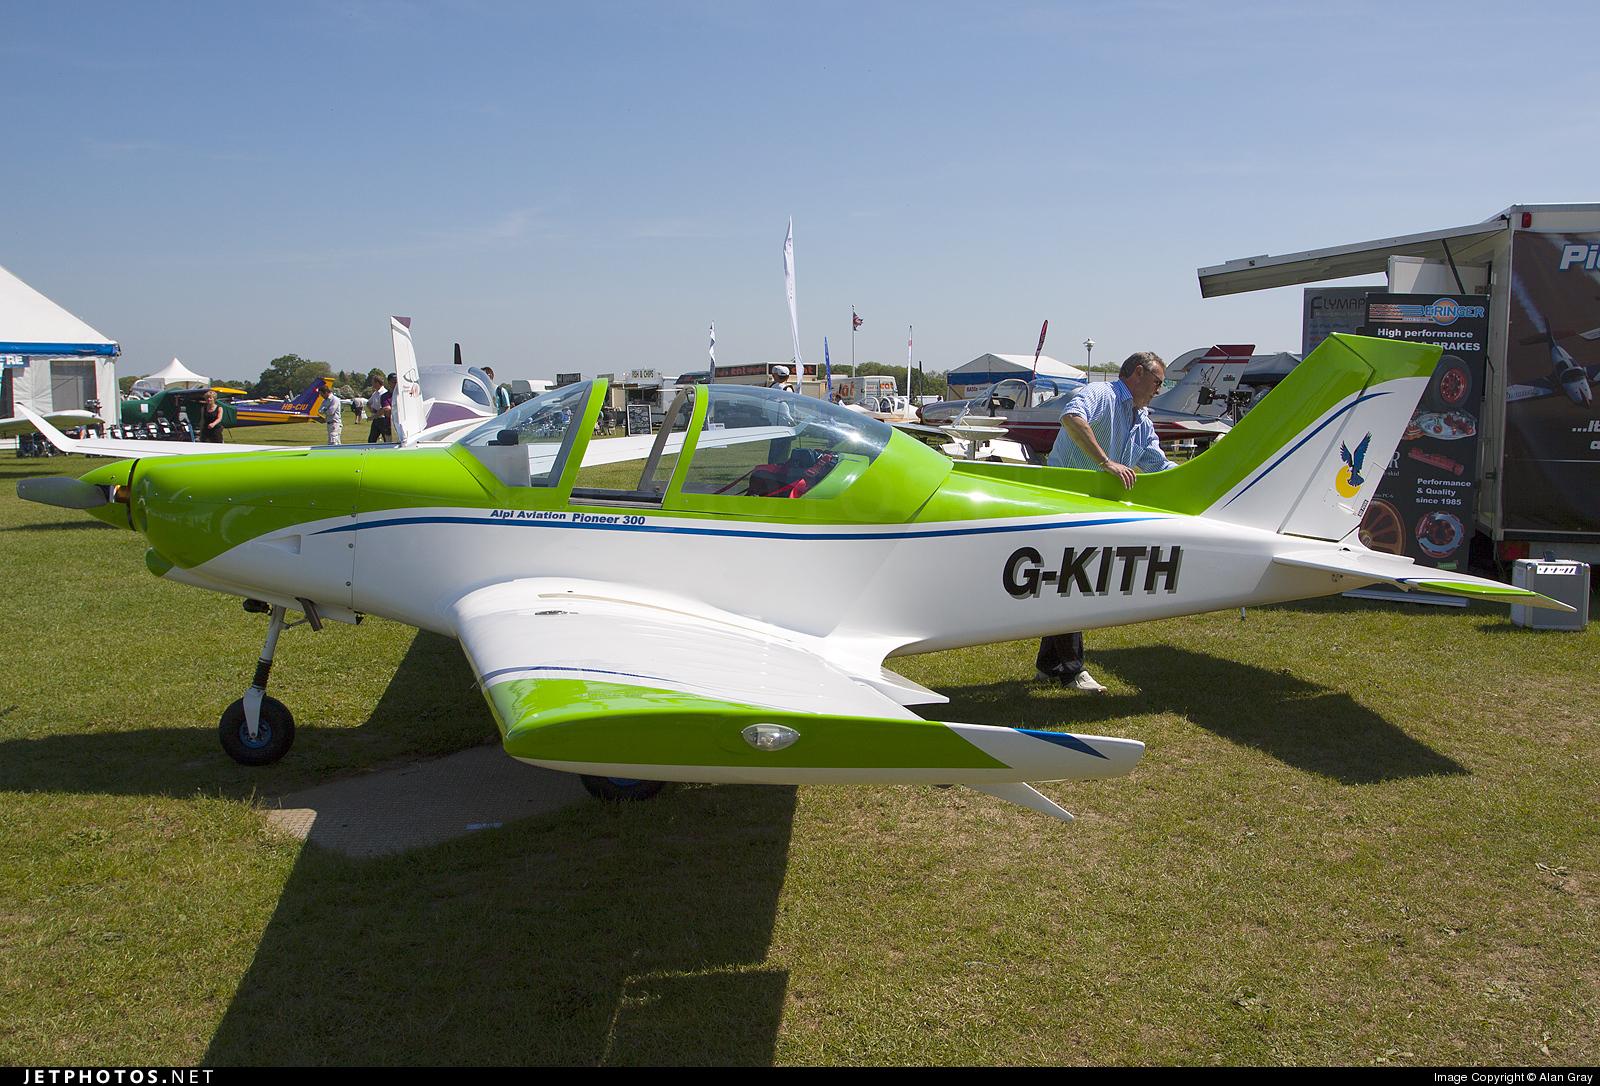 G-KITH - Alpi Pioneer 300 - Private